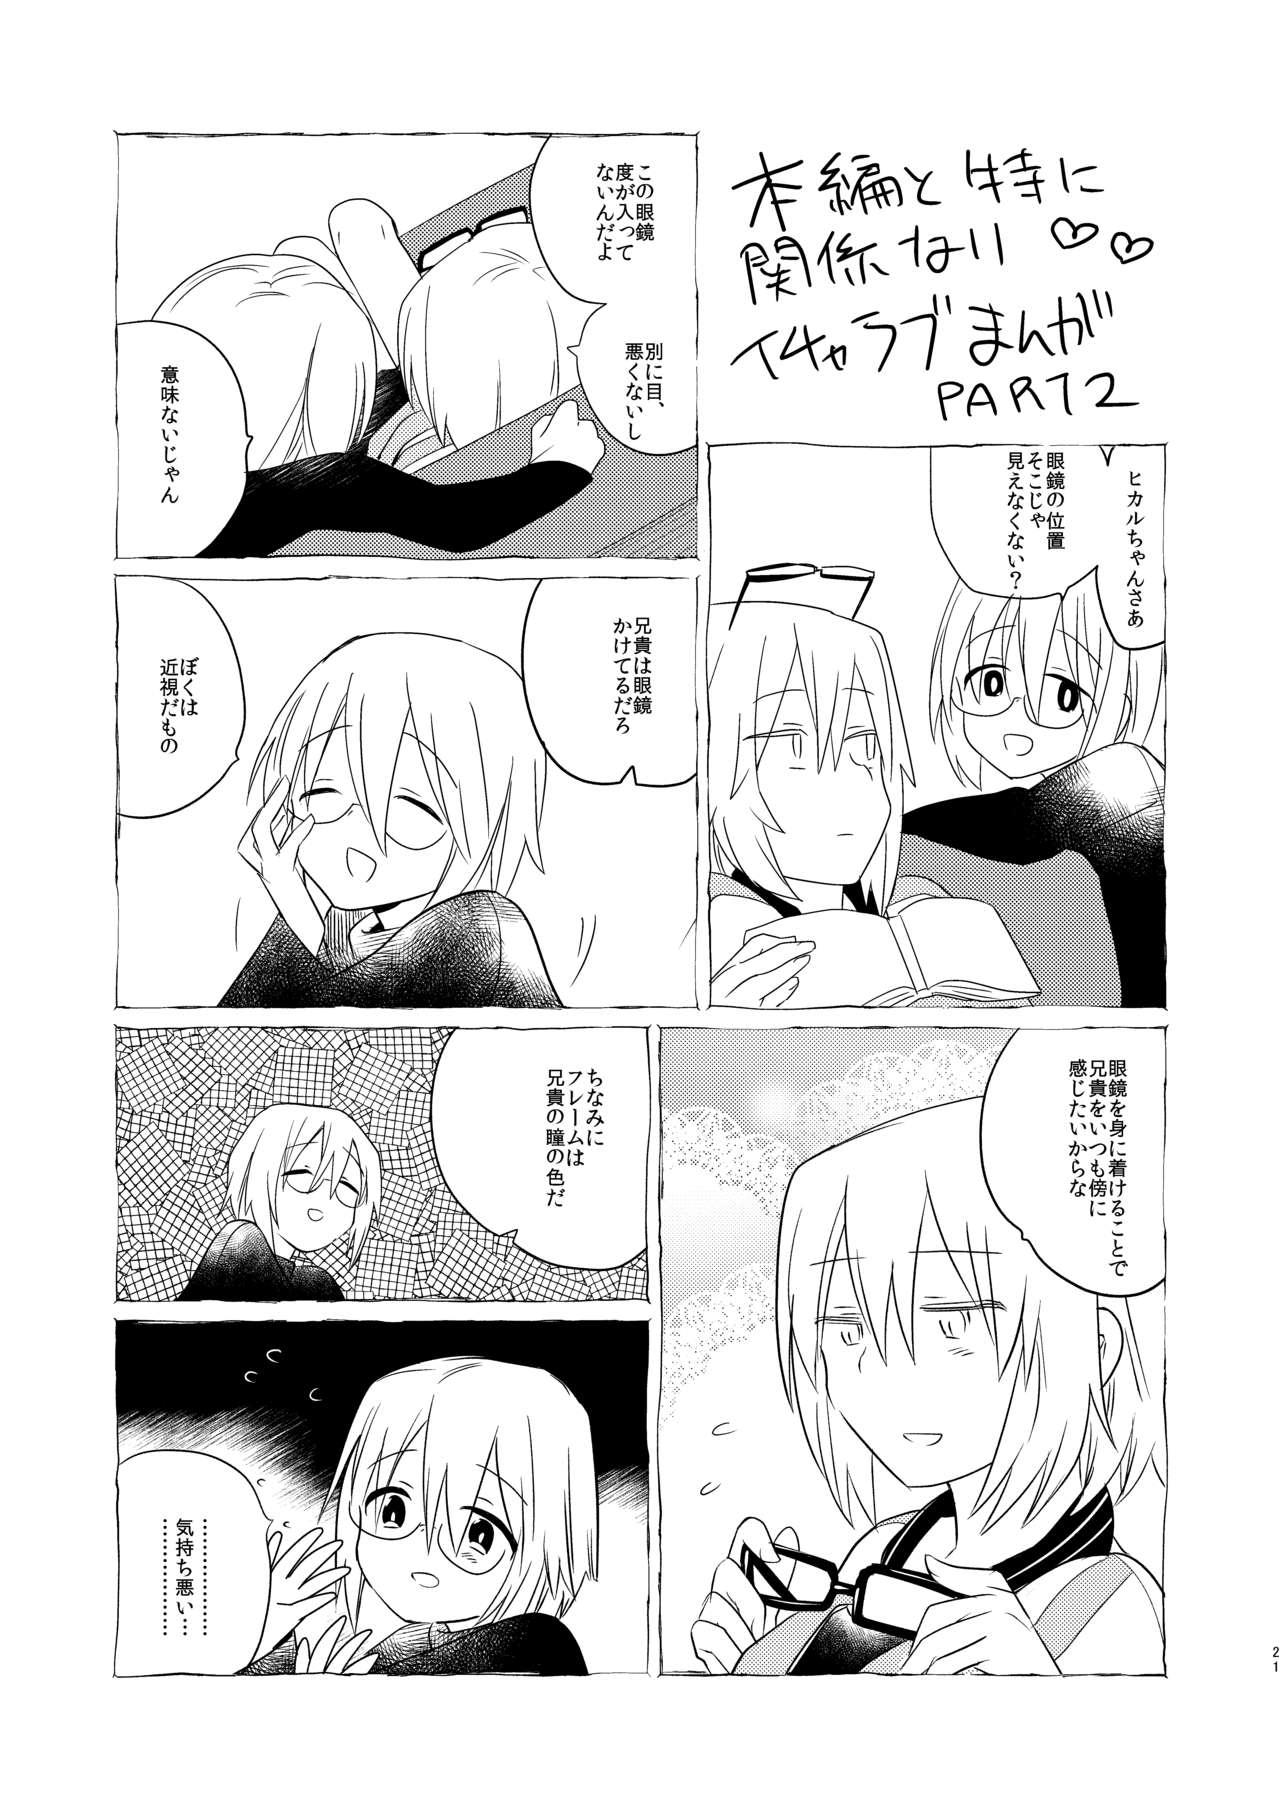 [TETRARA (Tokiwa Yutaka)] Ikenai Onii-chan to Ichaicha -Agape- [Digital] 18